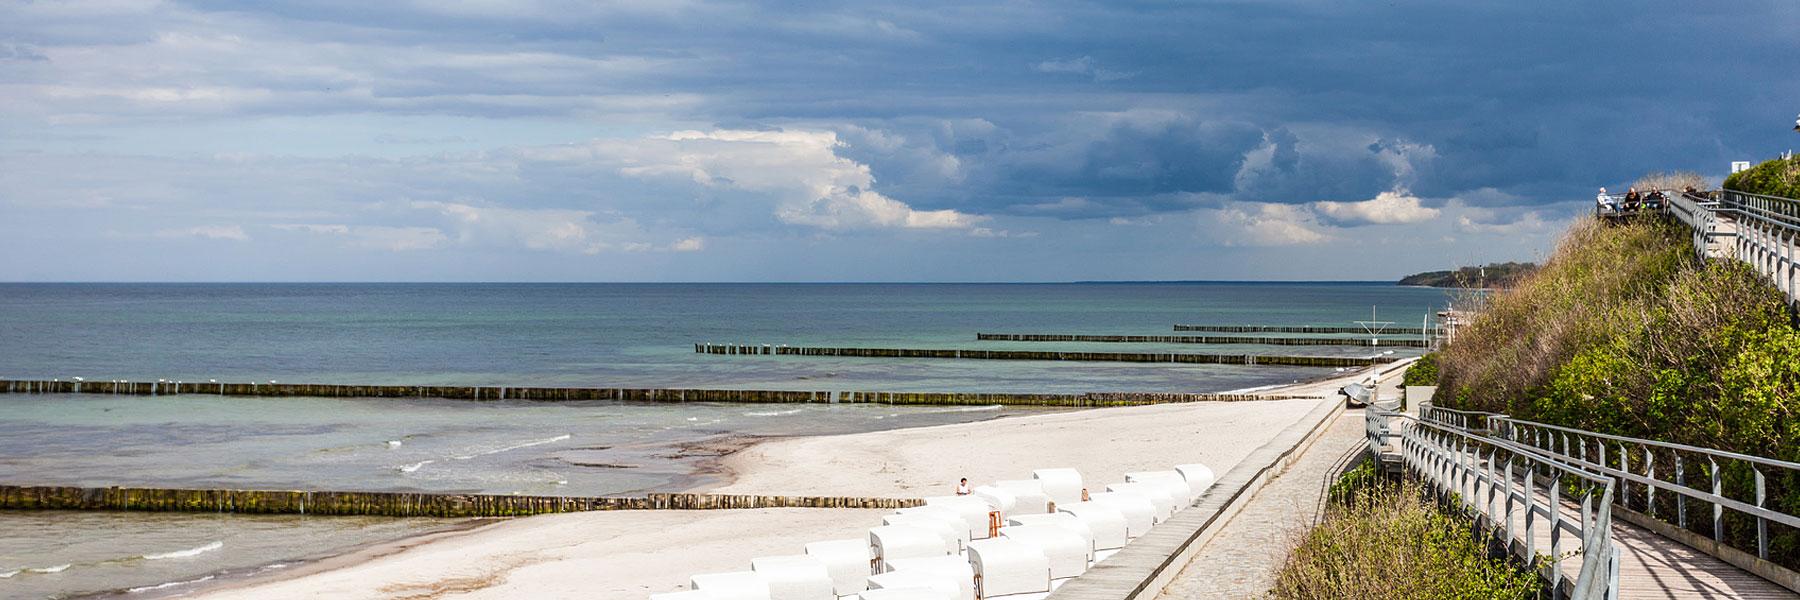 Strandaufgang - Ostseebad Nienhagen